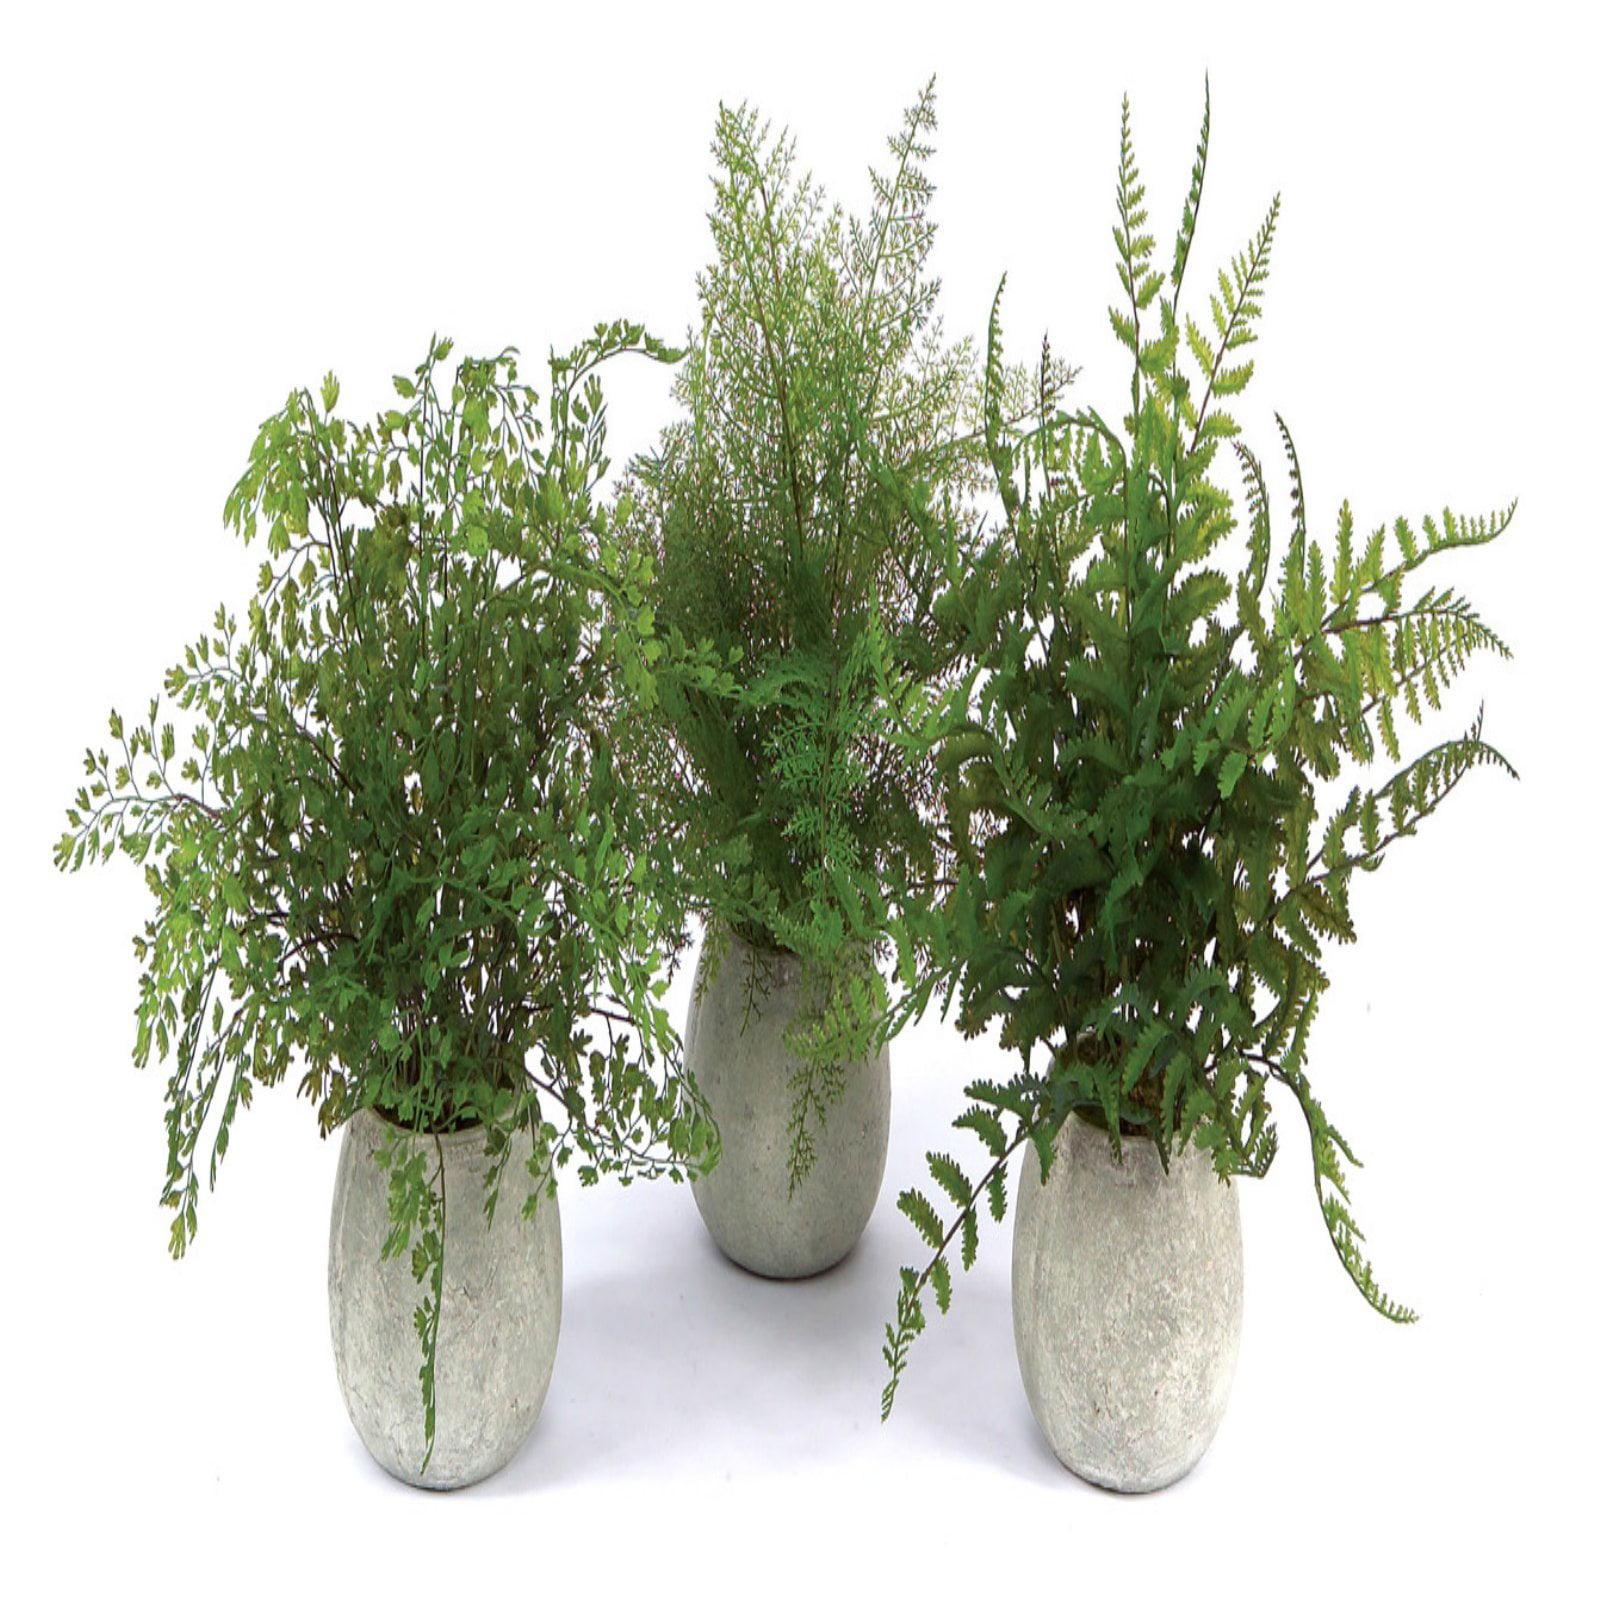 Melrose International Potted Fern Silk Plants - Set of 3